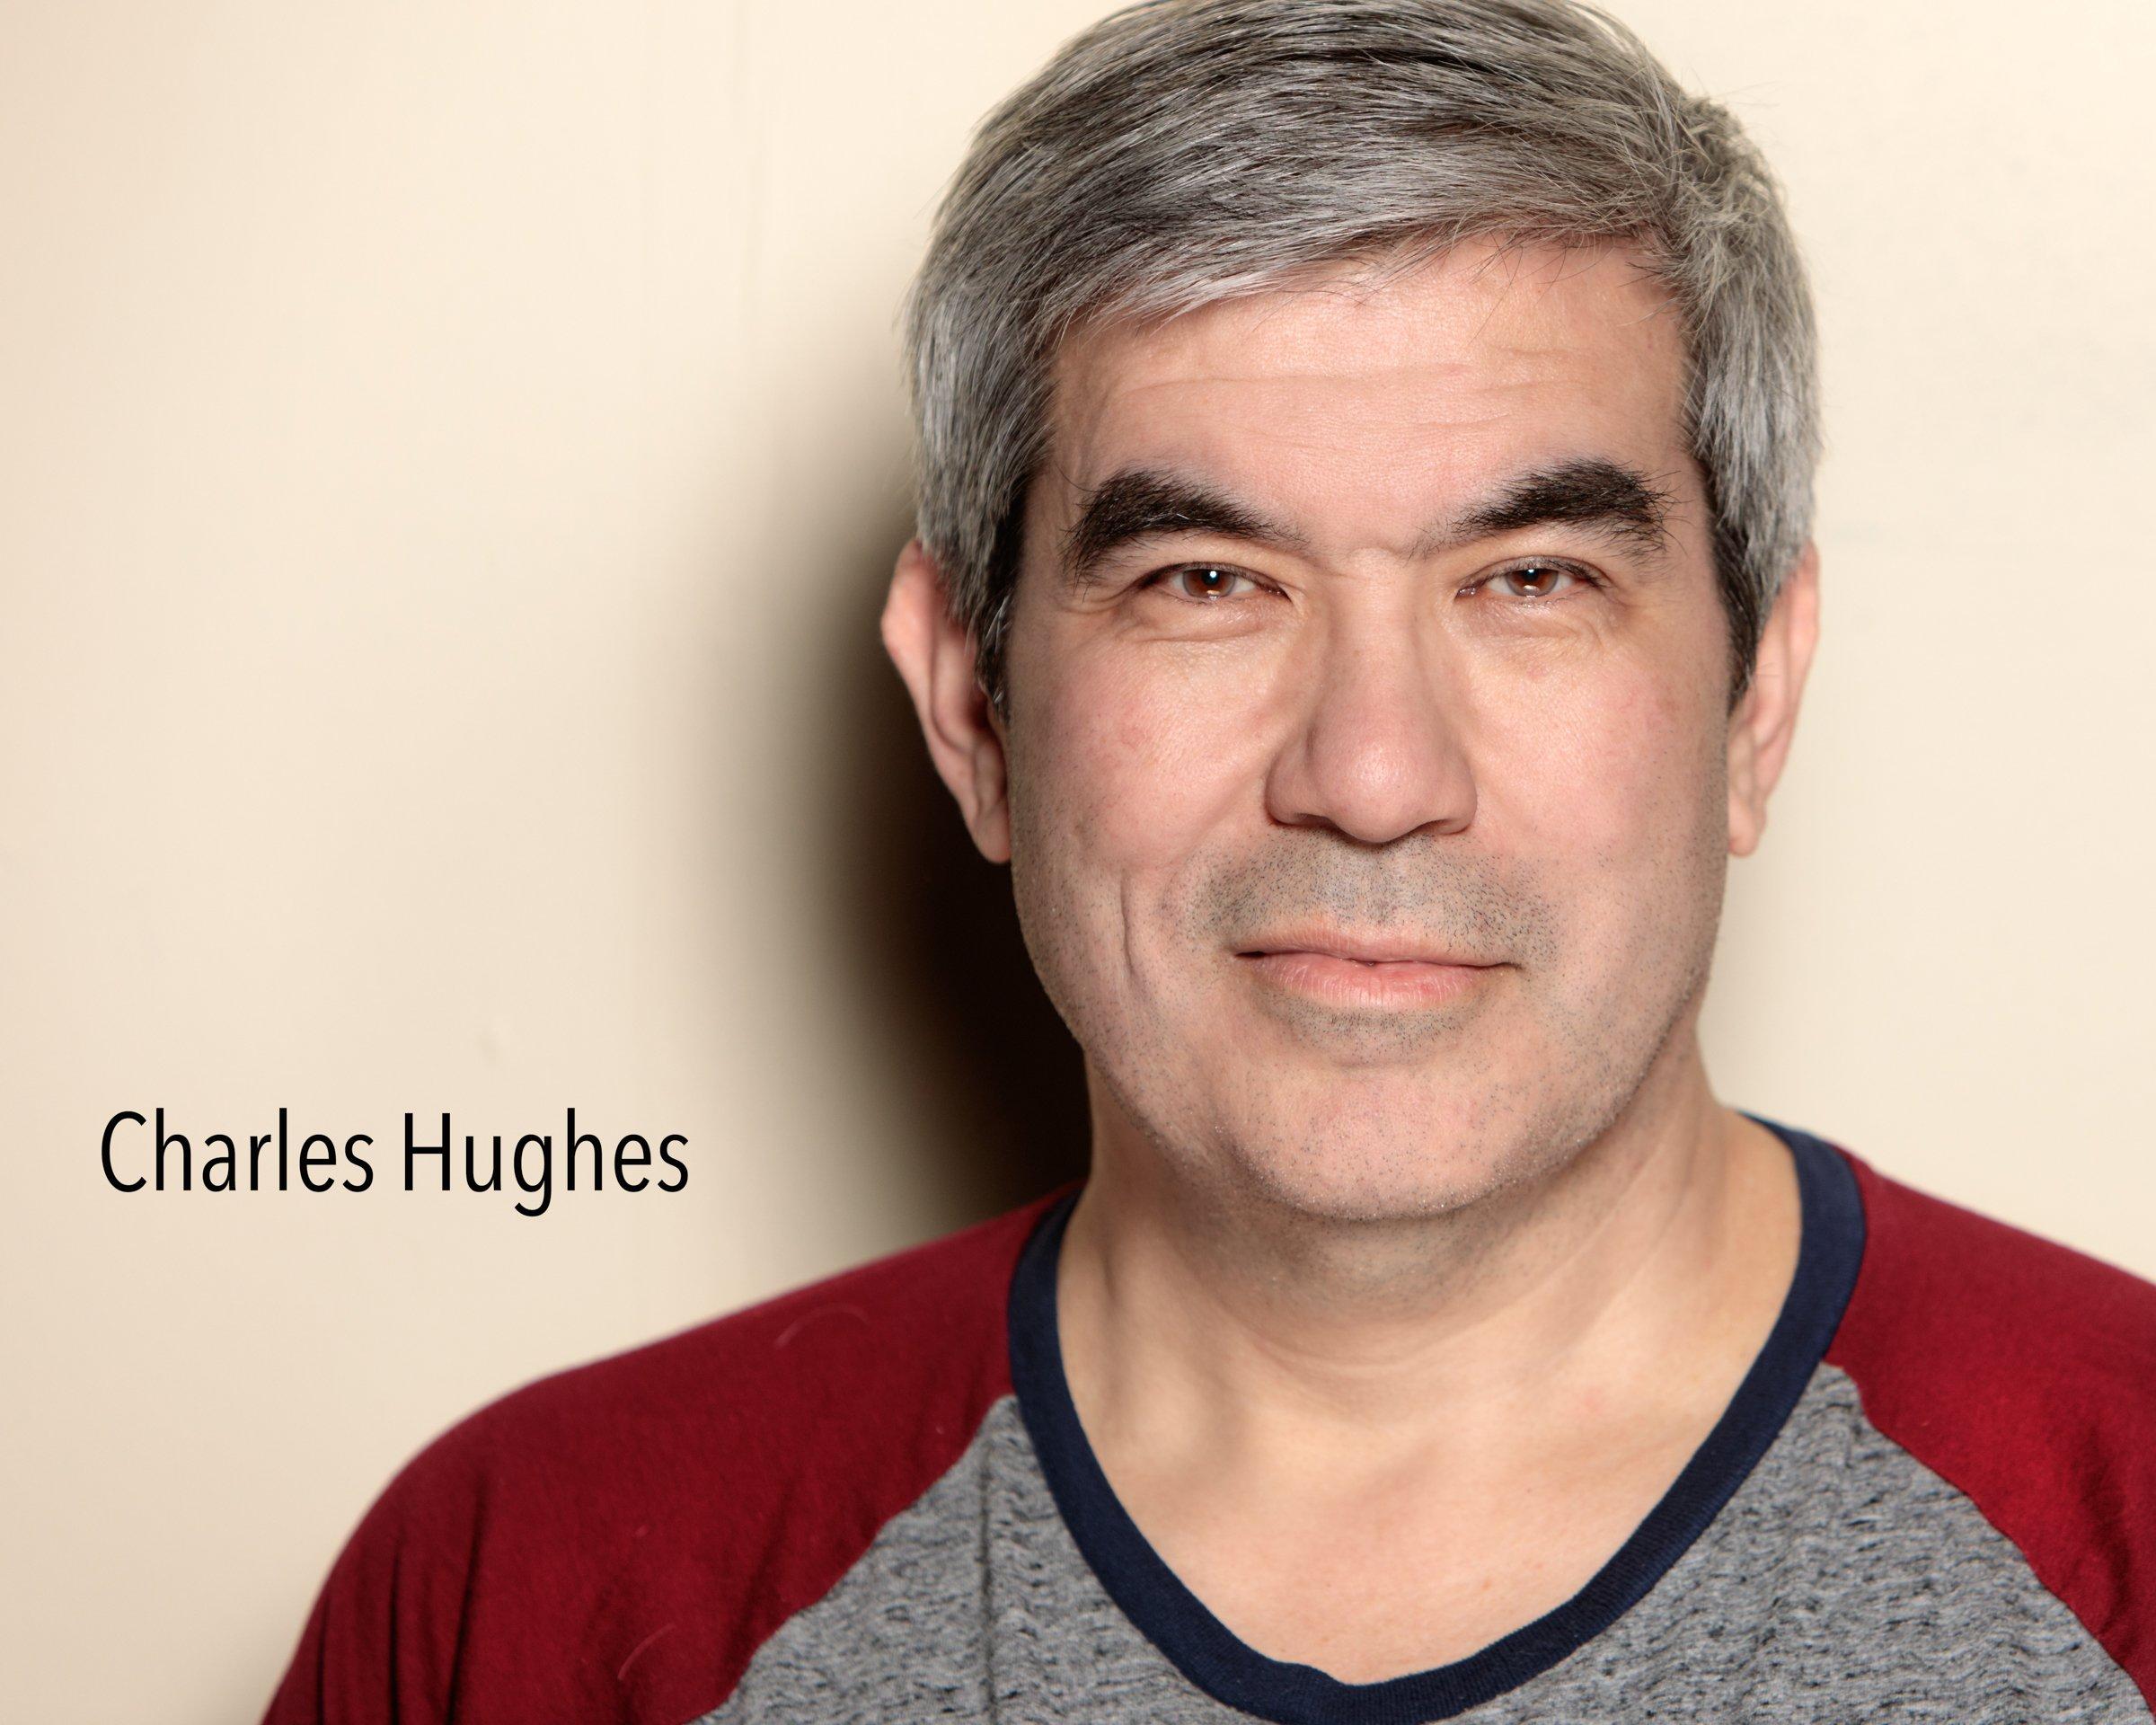 Charles Hughes